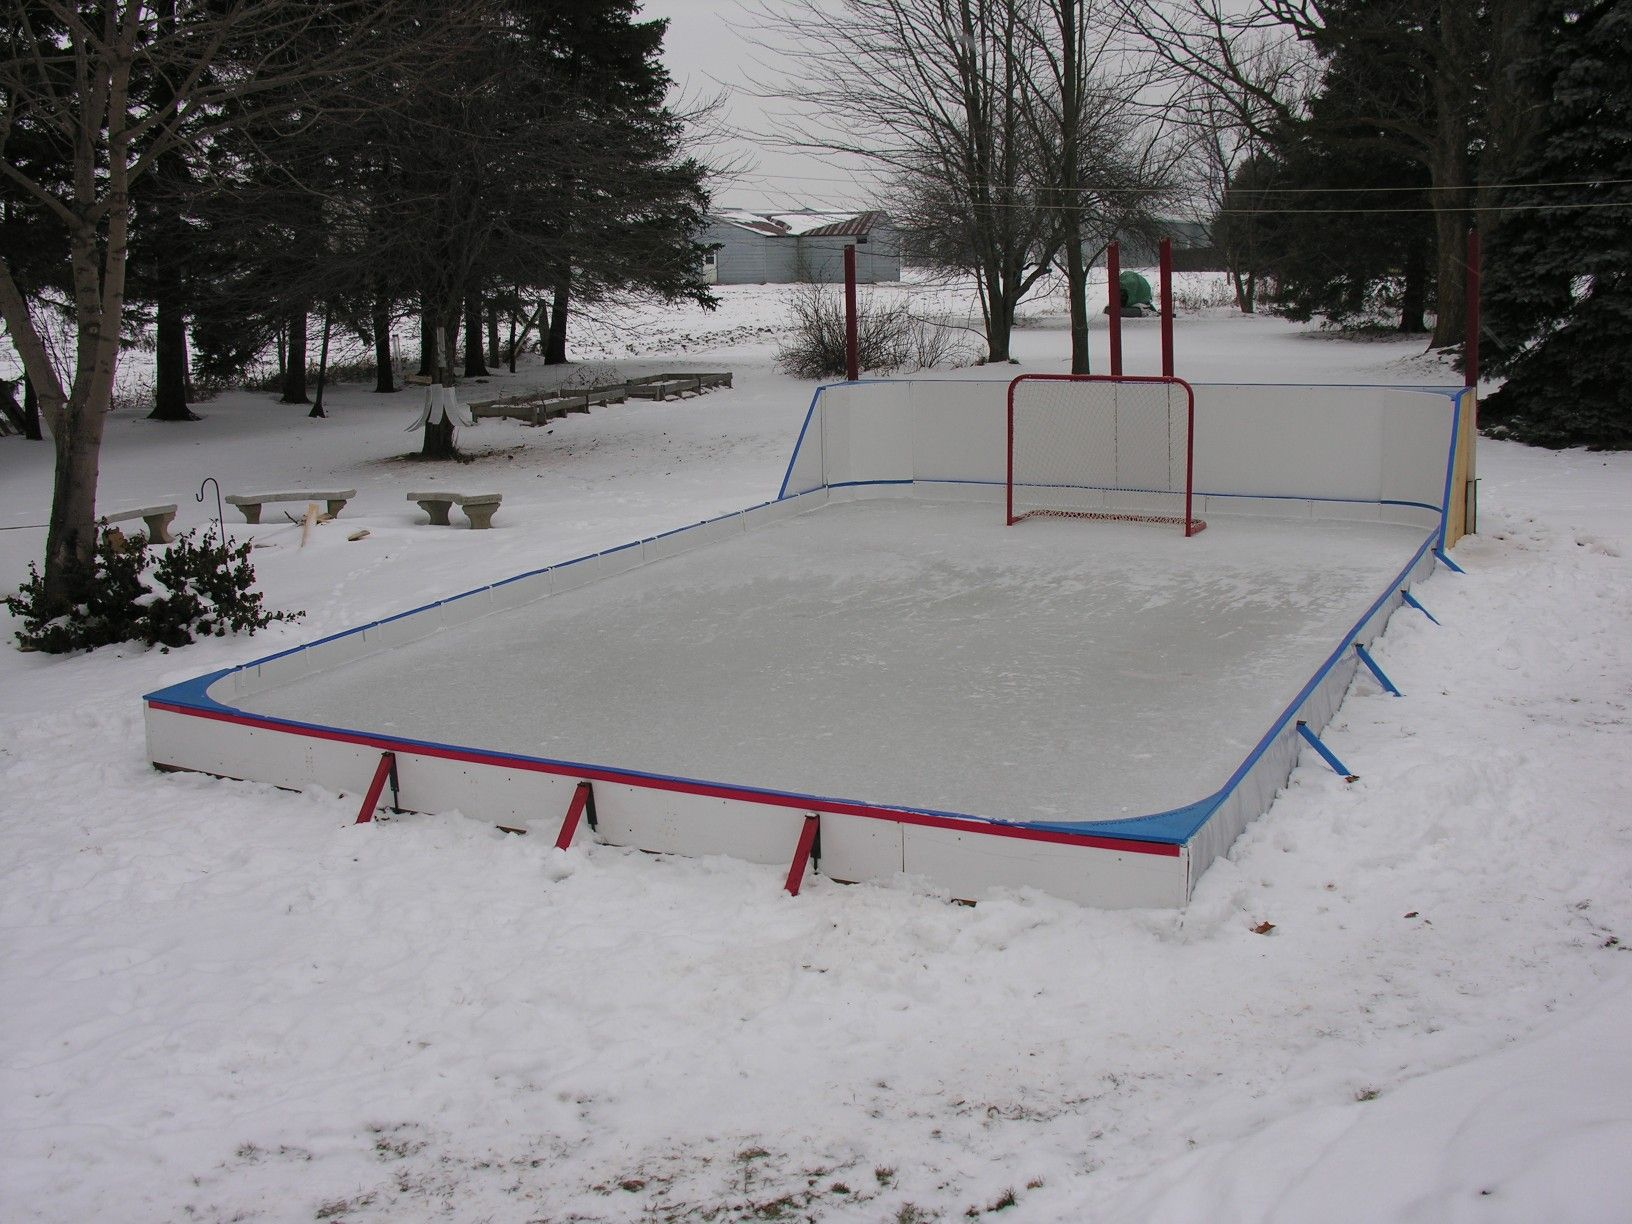 Pin by Chris Detzler on Backyard Rink | Backyard ice rink ...